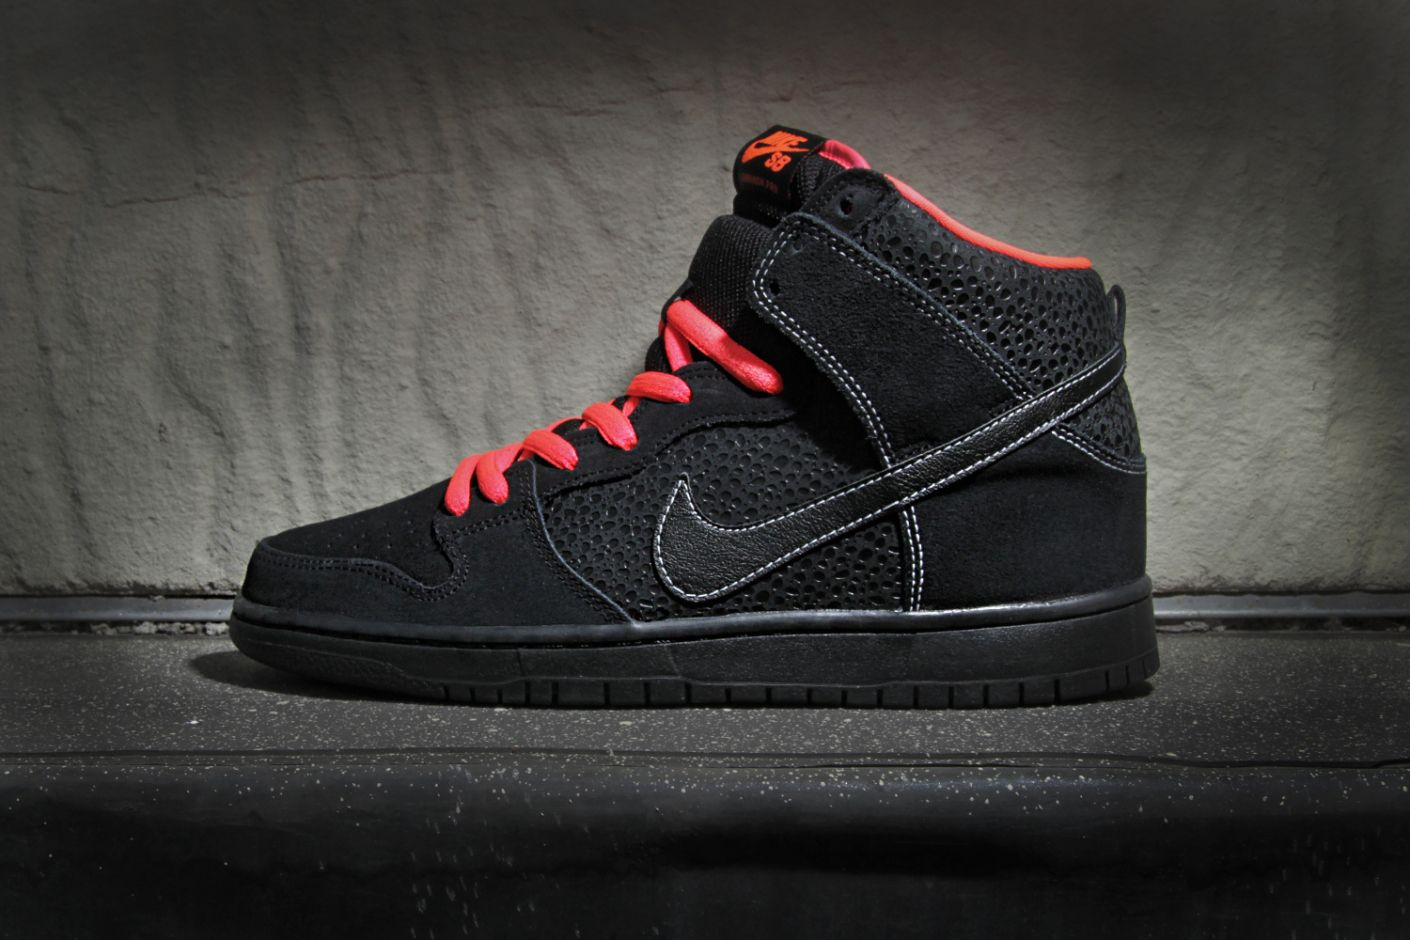 Nike Sb Dunk High Pro Black Atomic Red Nike Nike Sb Dunks Popular Sneakers